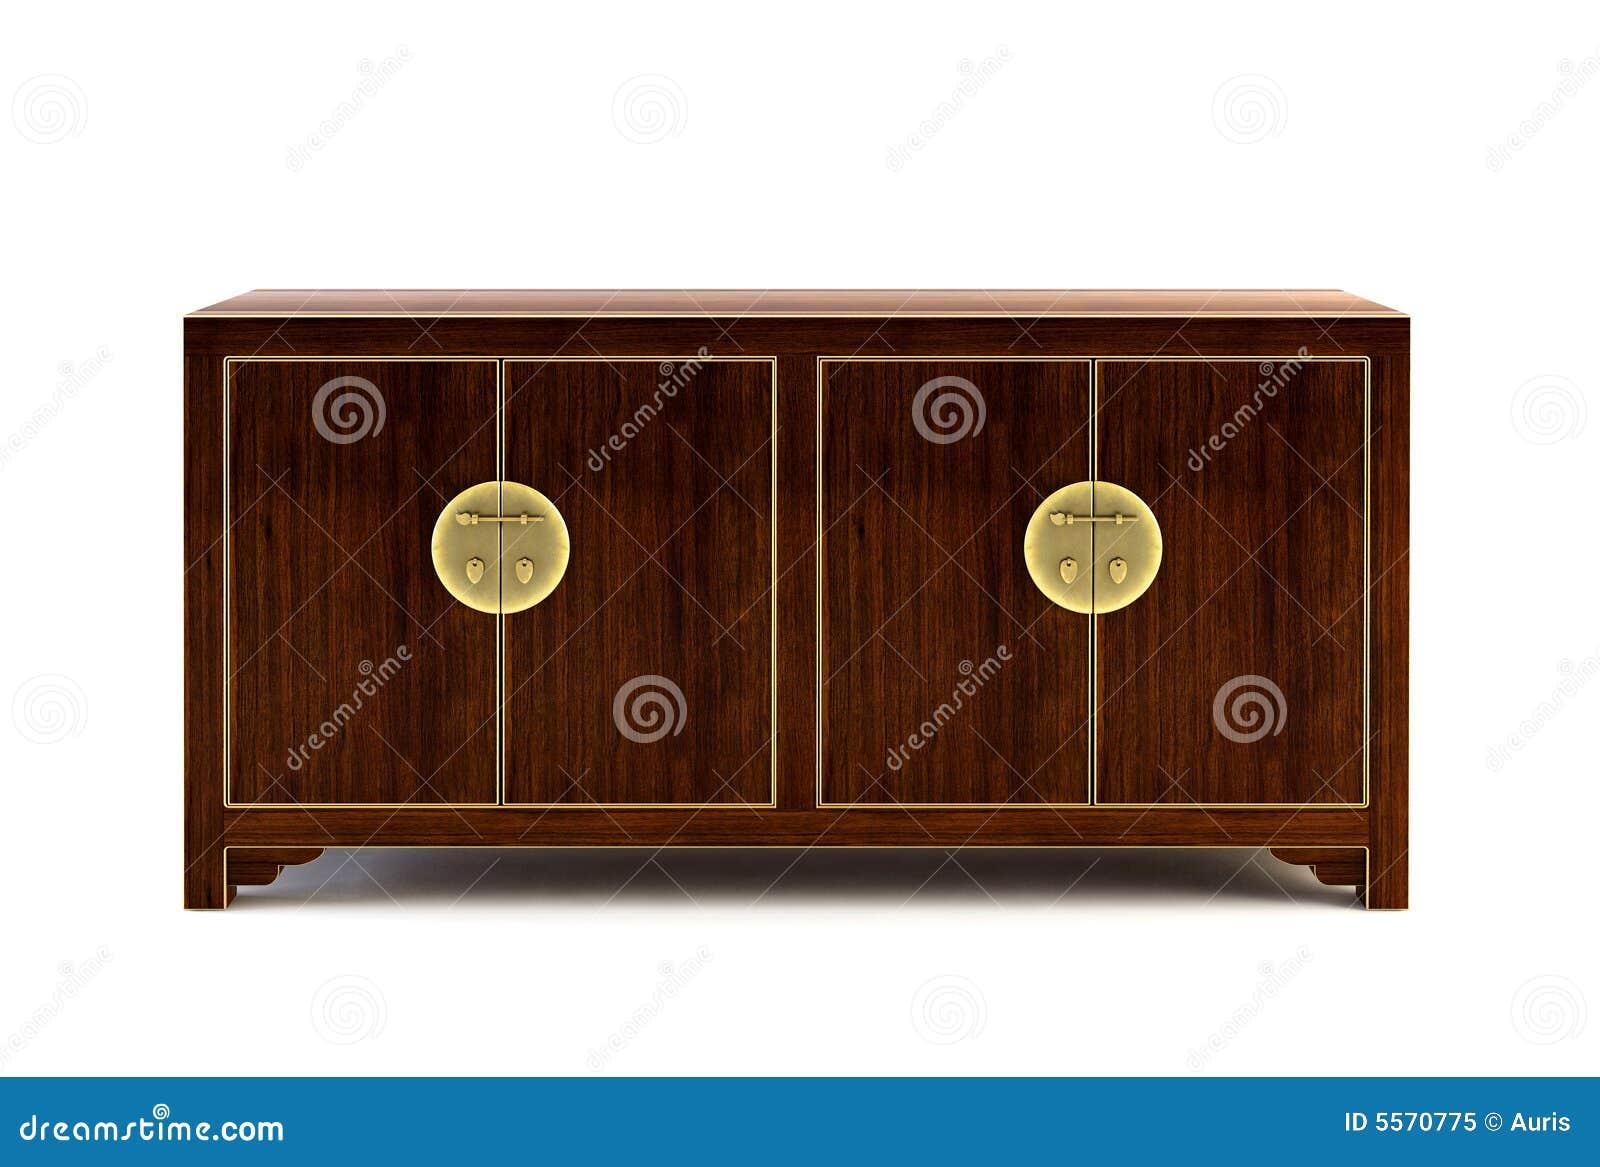 bureau 3d rendering royalty free stock photo image 5570775. Black Bedroom Furniture Sets. Home Design Ideas